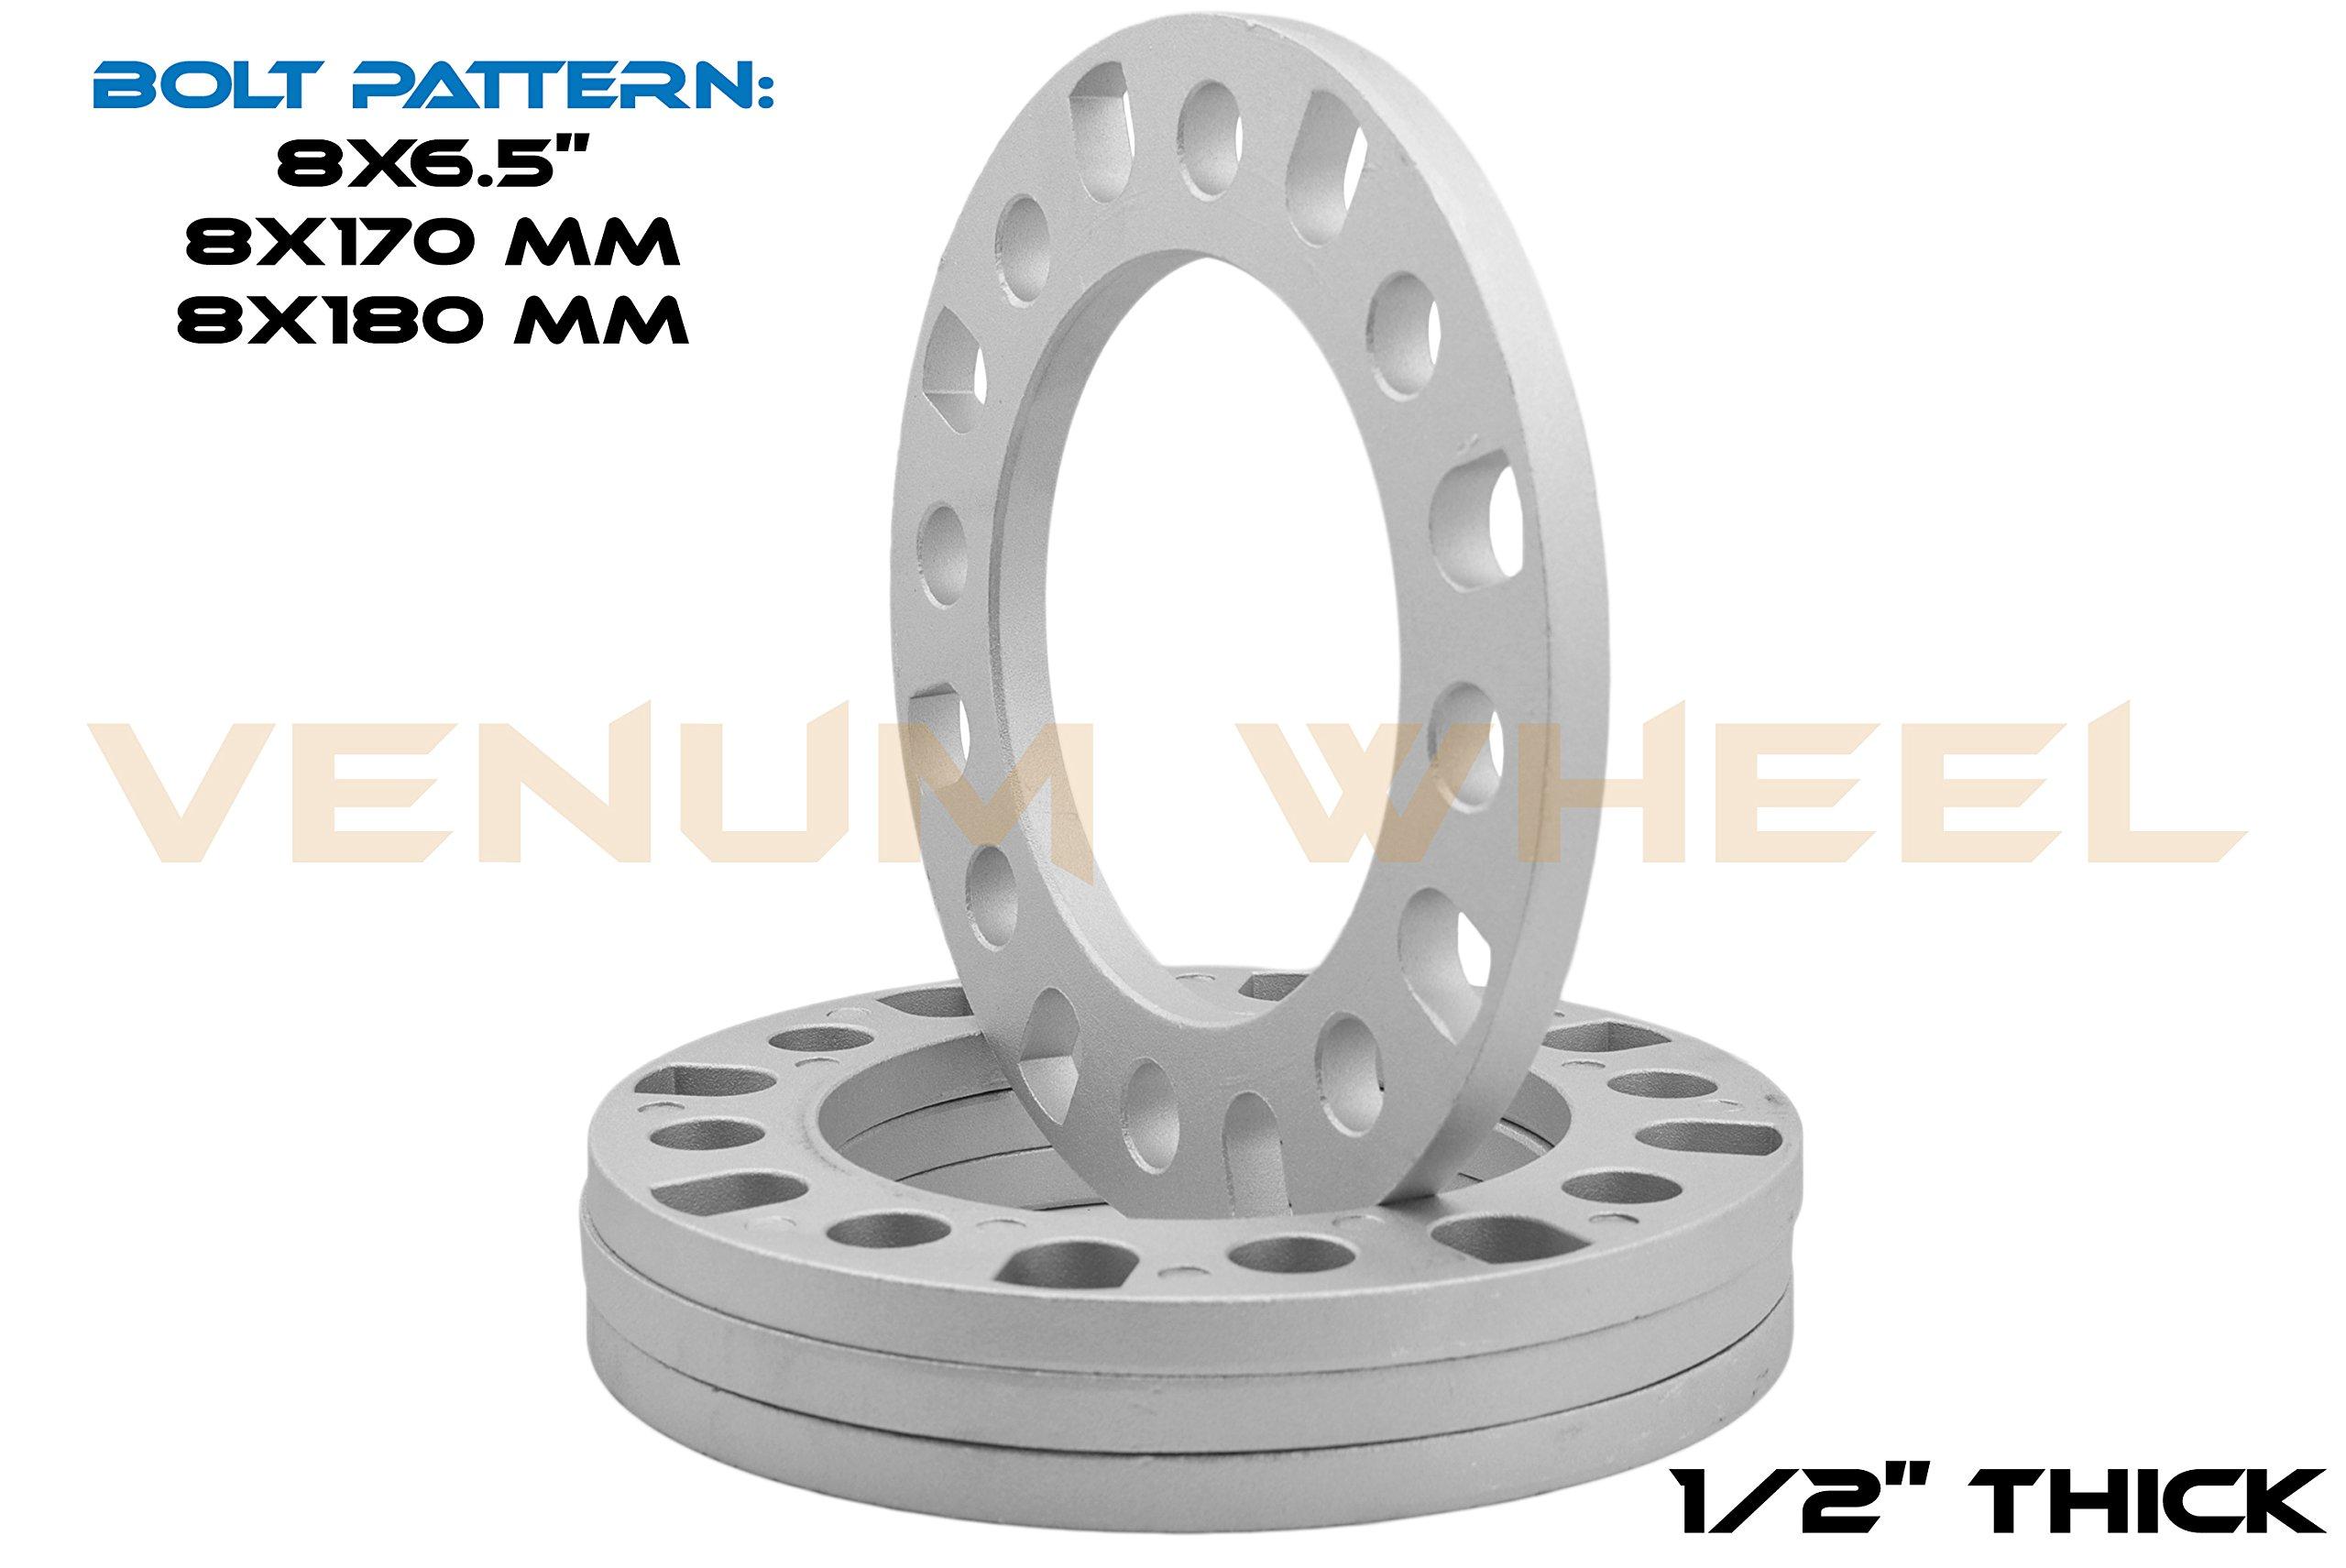 GDSMOTU 1//4 8 Lug Wheel Spacers 8x6.5 8x170 for Chevrolet Silverado 2500 3500 2016 4PC